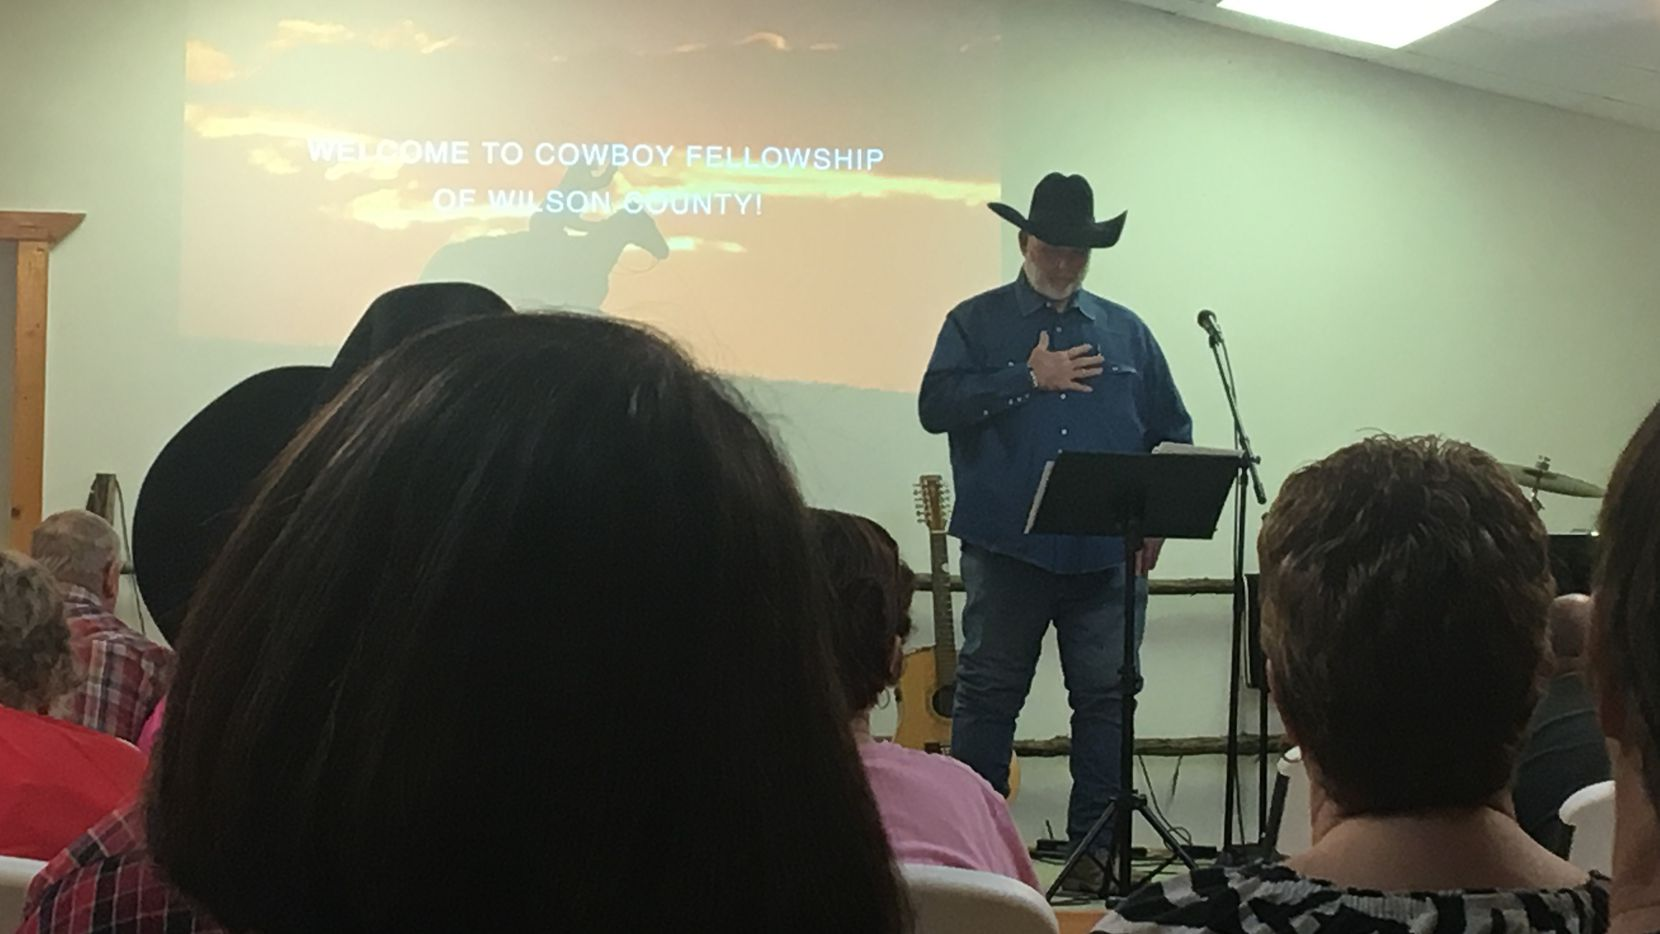 Elder Jarrell Hill of Cowboy Fellowship of Wilson County addressed fellow church members Monday night. (Naomi Martin/Staff)